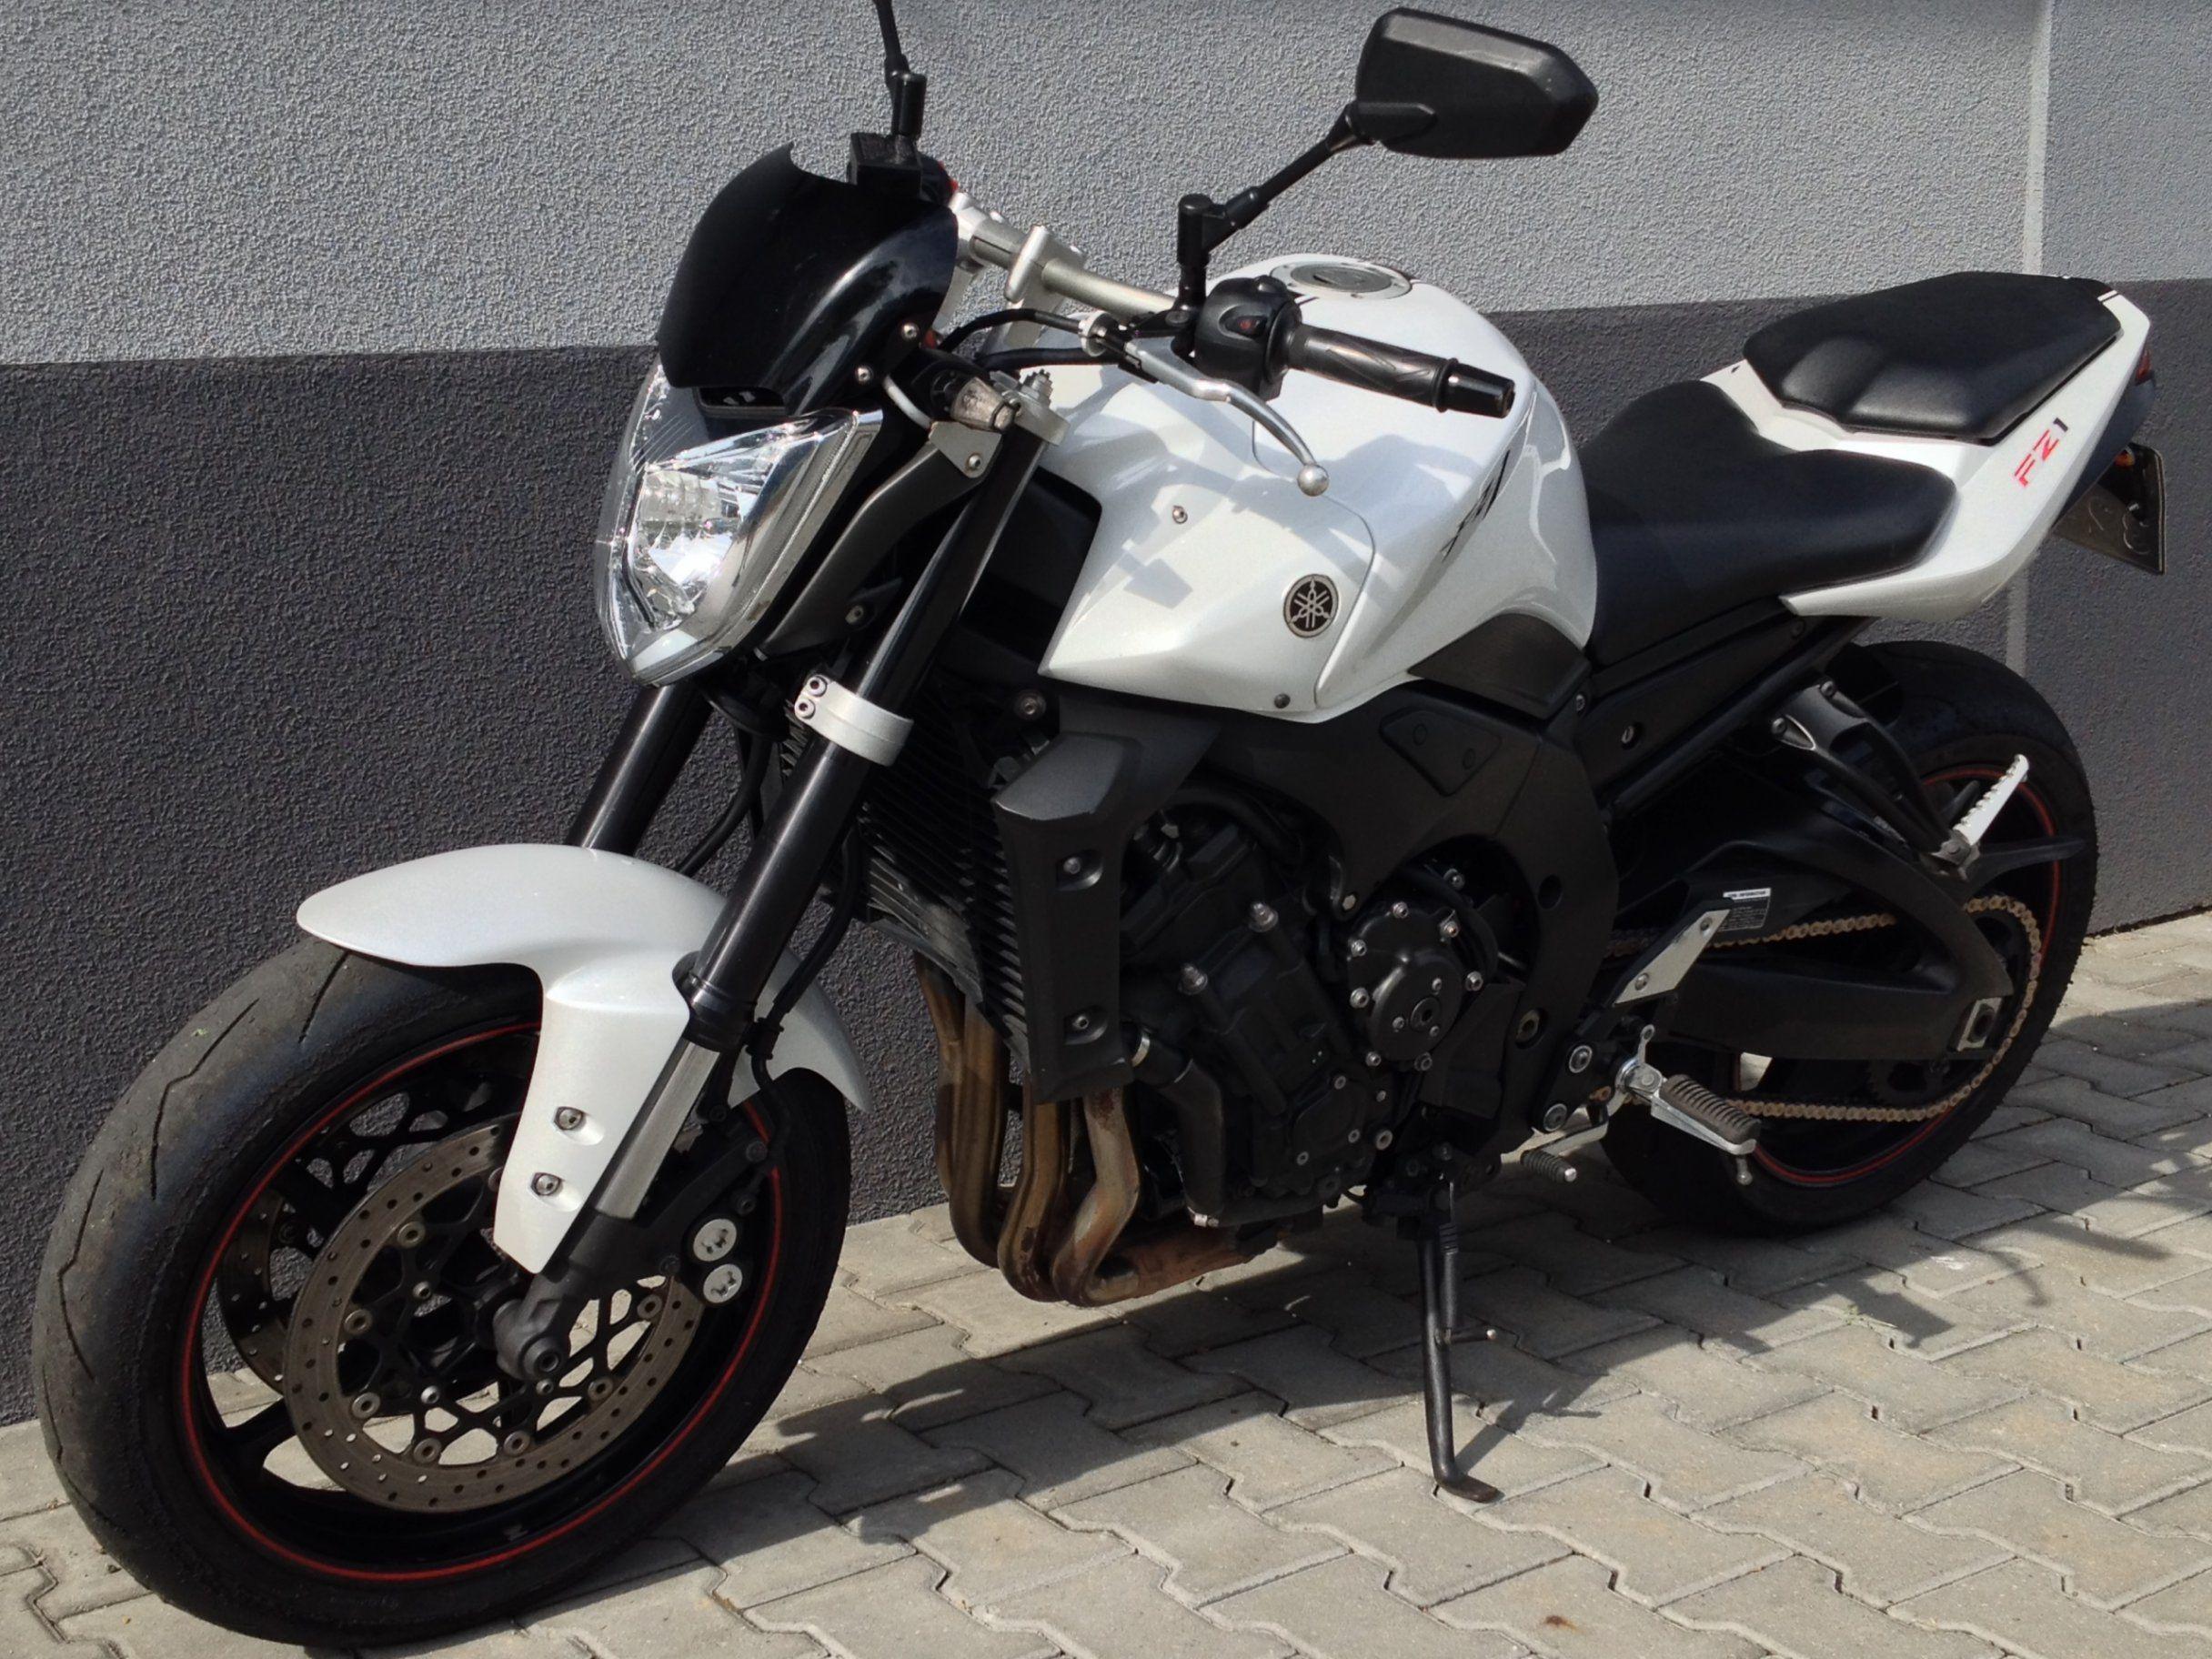 Yamaha Fz1n 2010 Rok Fz 1n Biala Perla Alarm 6287911797 Oficjalne Archiwum Allegro Motorrad